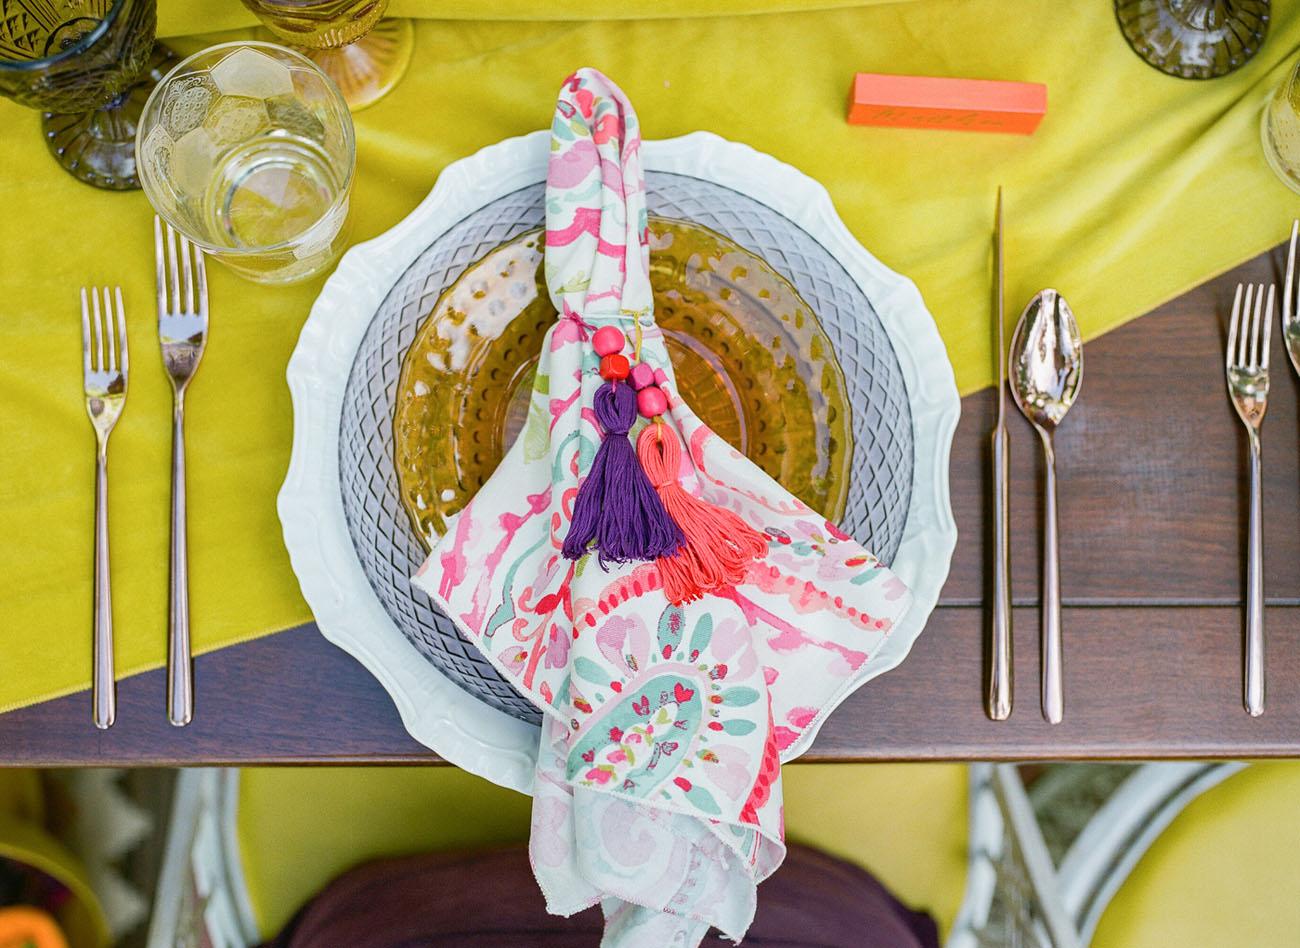 colored napkins